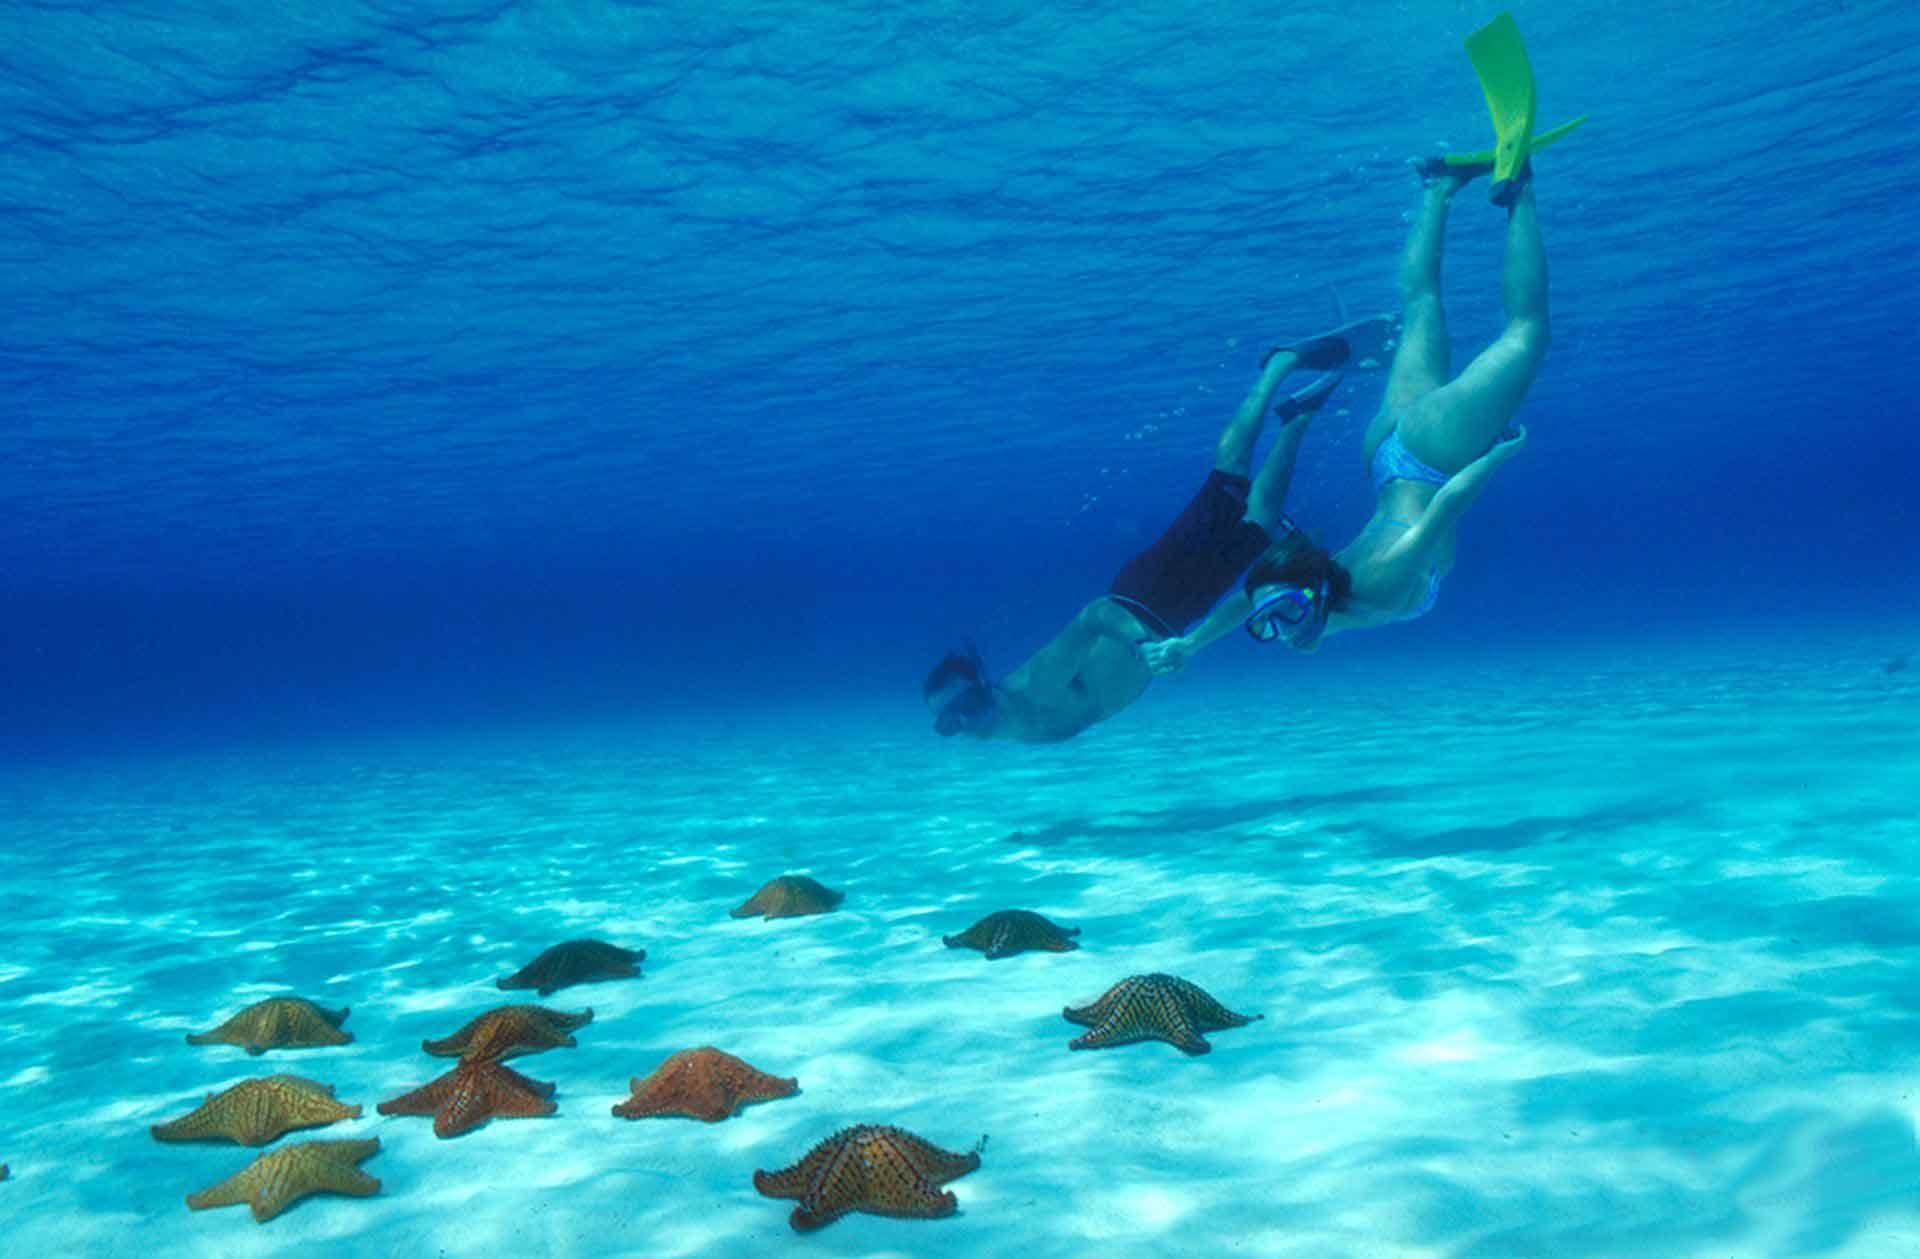 excursion-cozumel-riviera-maya-sl-3-o